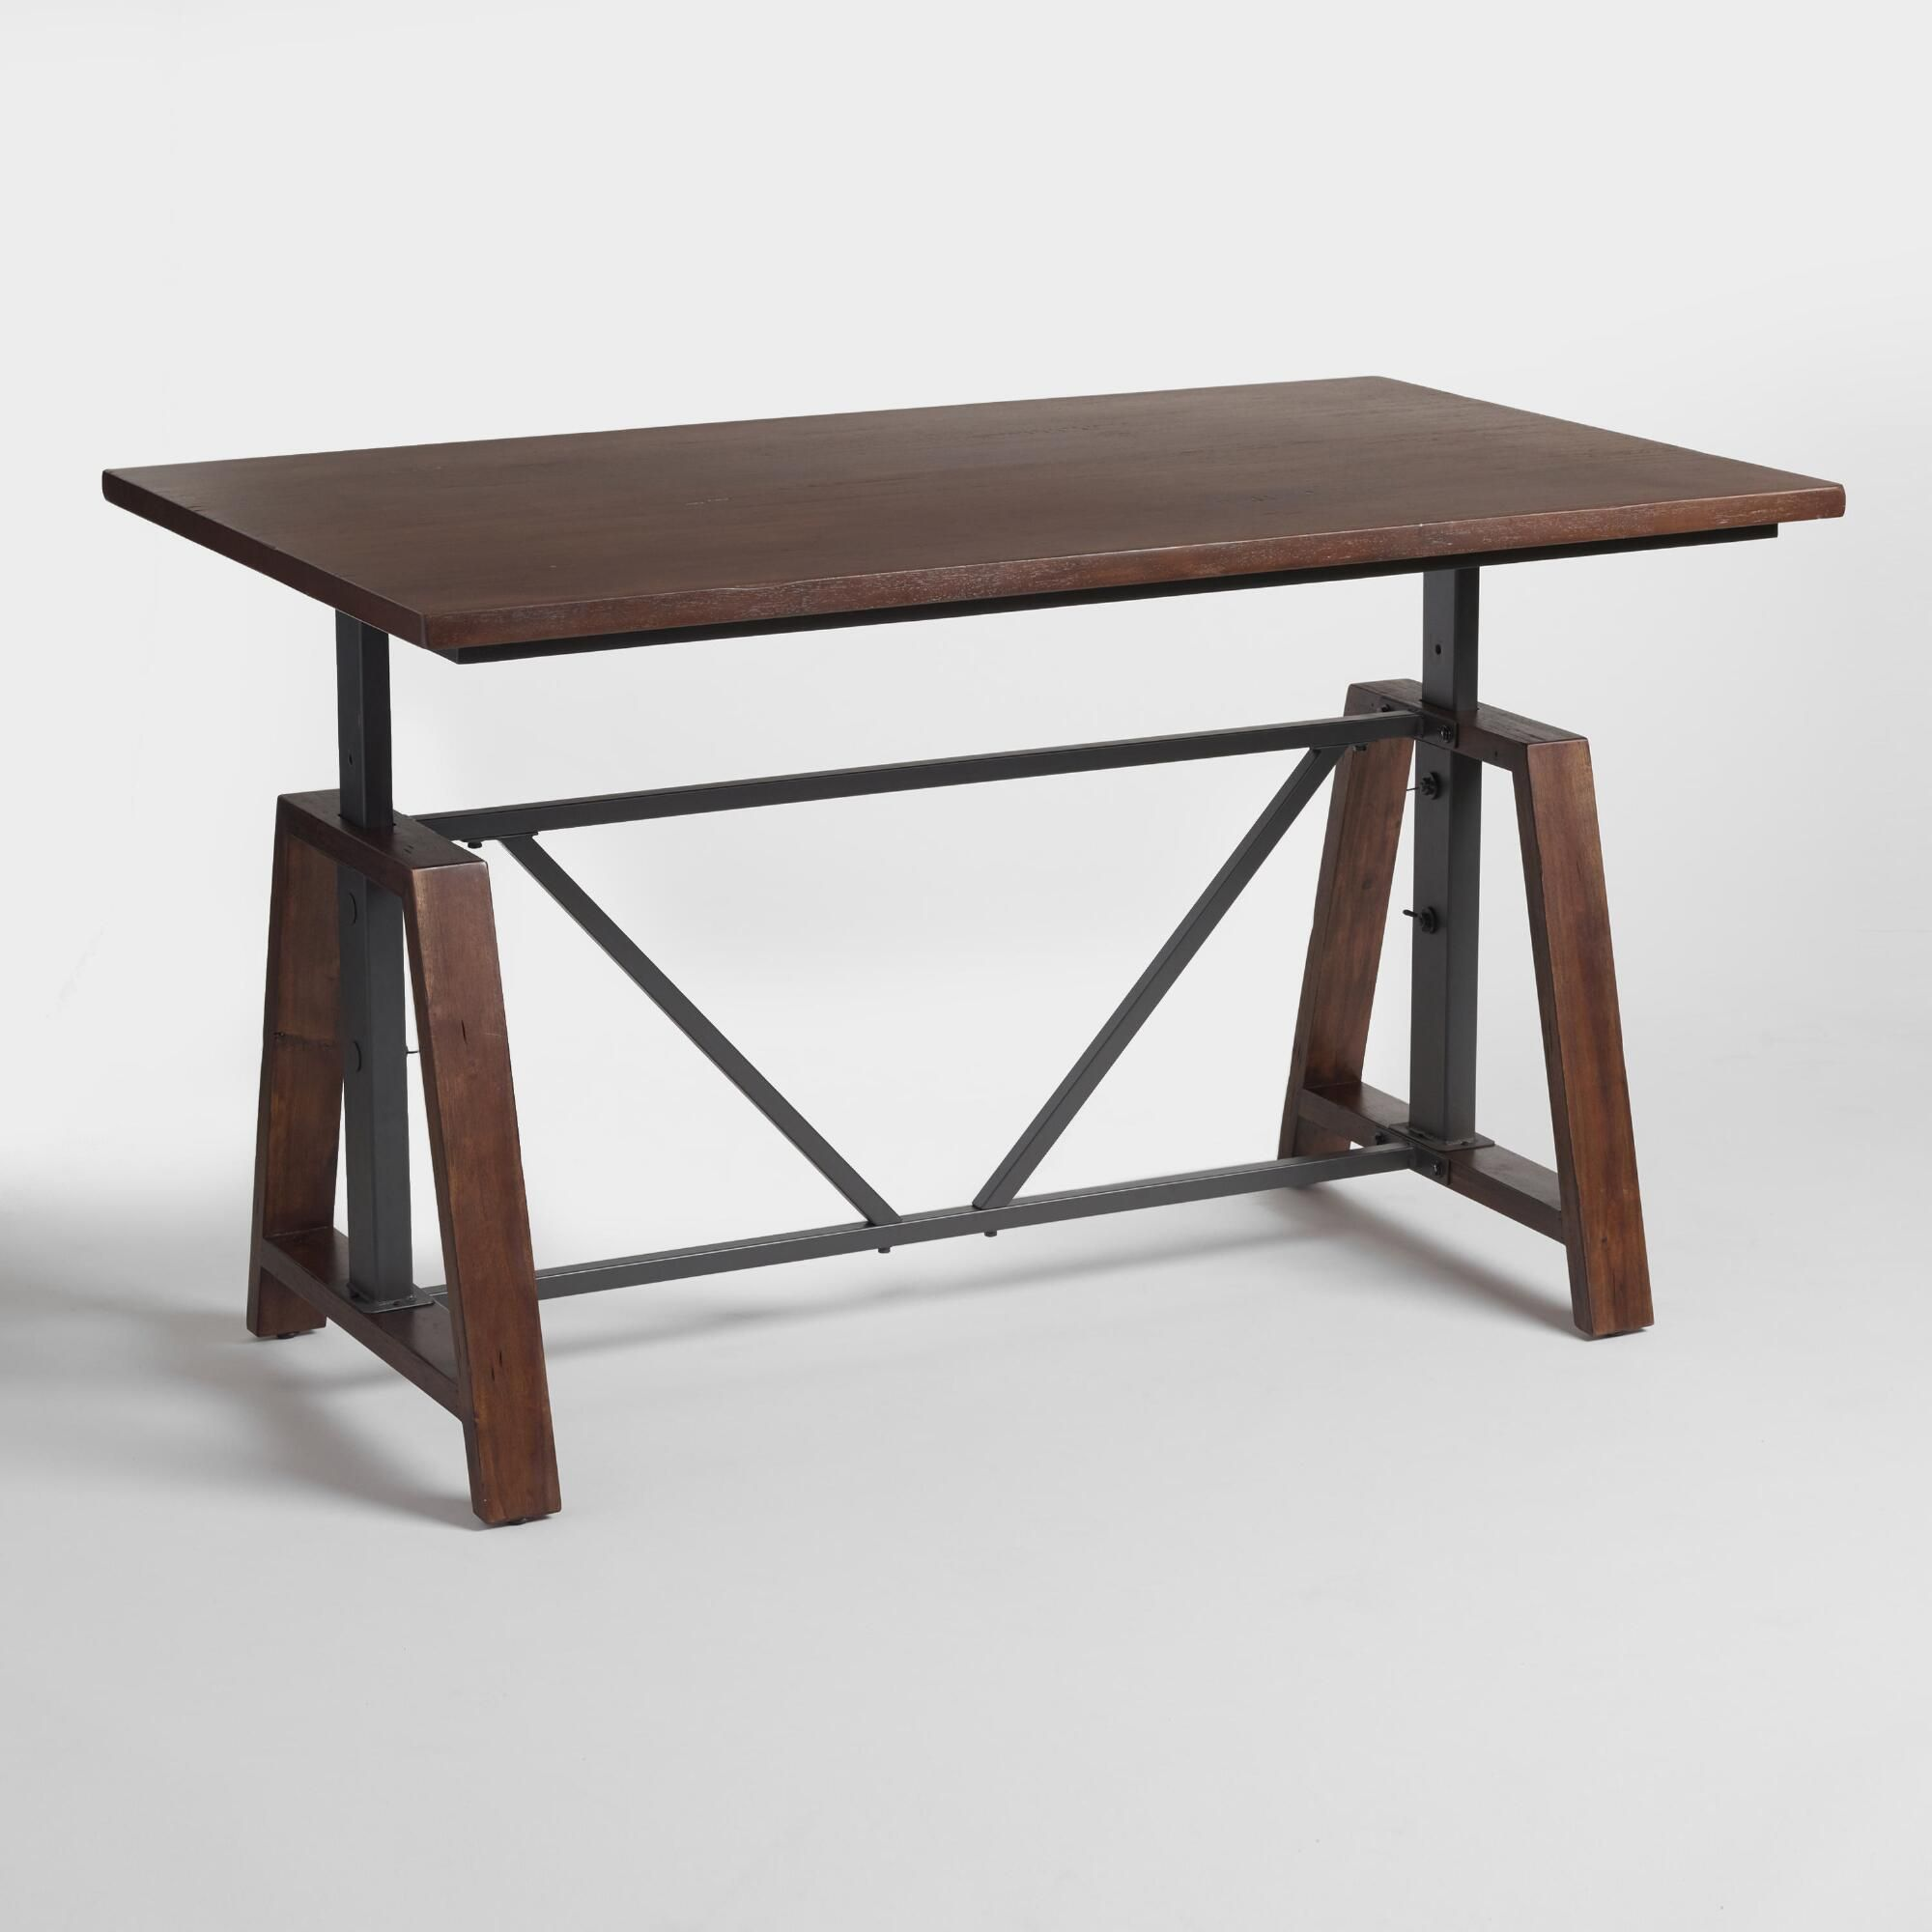 Wood Braylen Adjustable Height Work Table